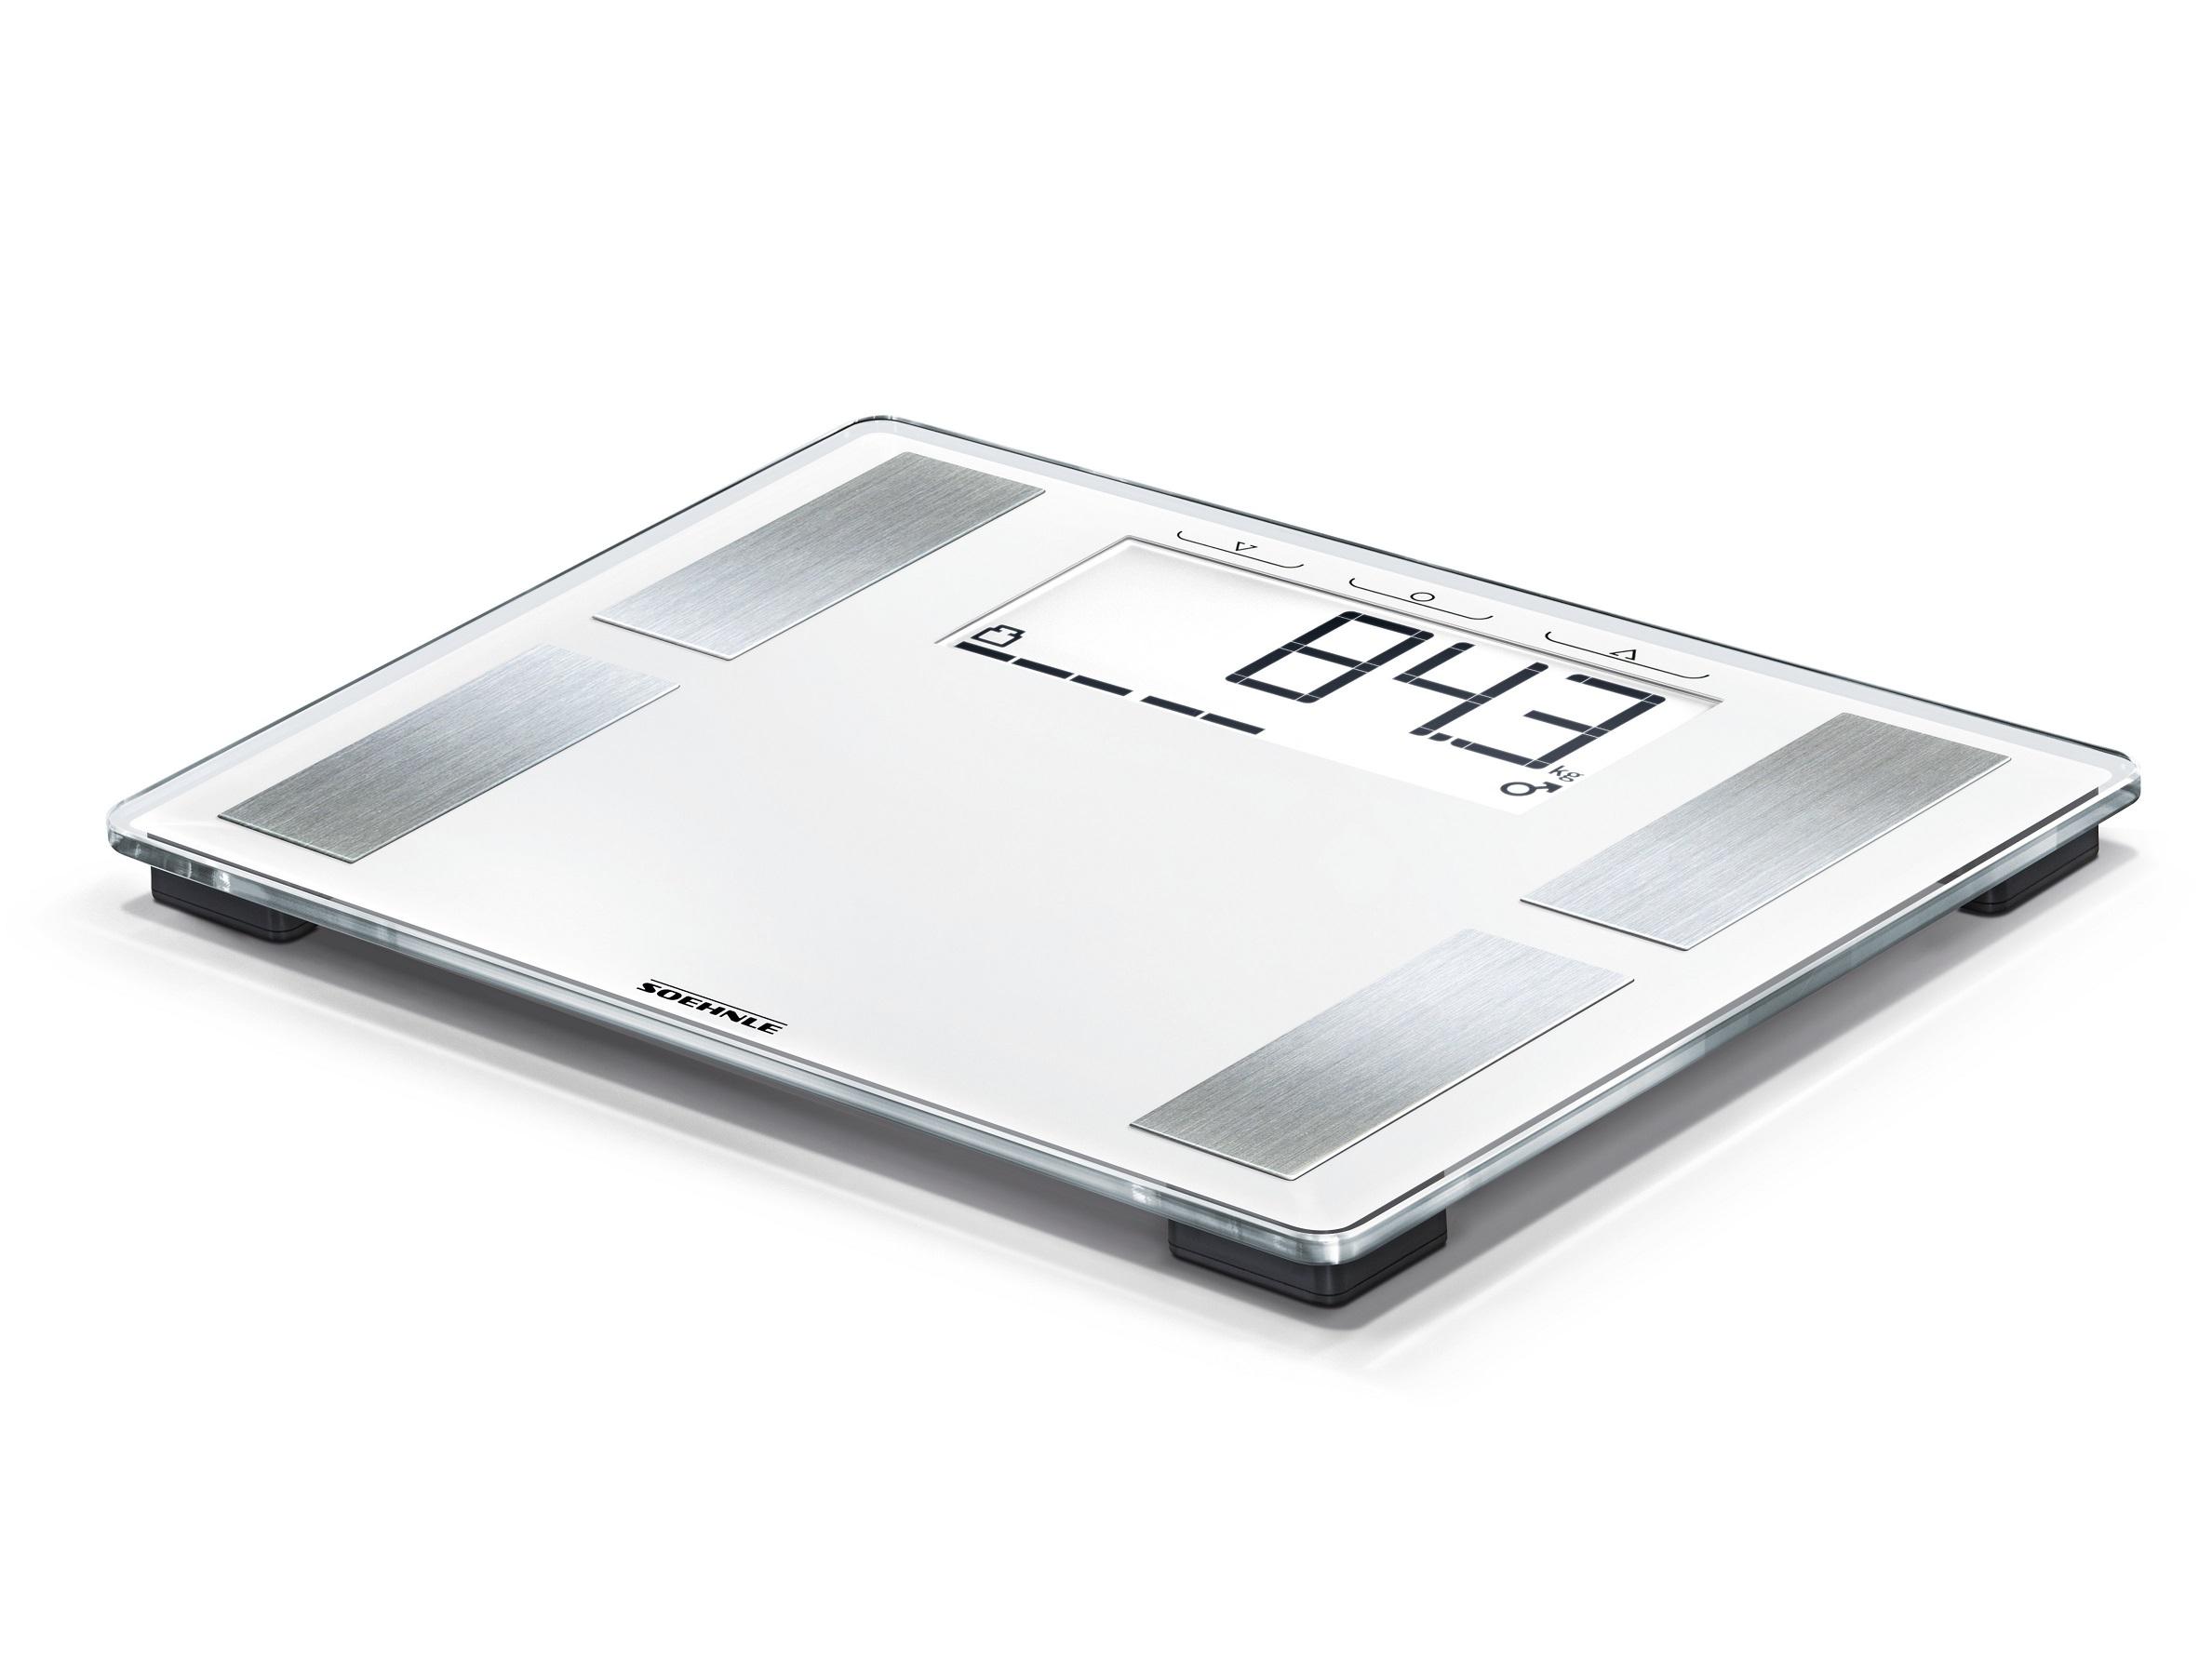 Soehnle Osobní váha SHAPE SENSE Profi 100 - digitální SOEHNLE 63868